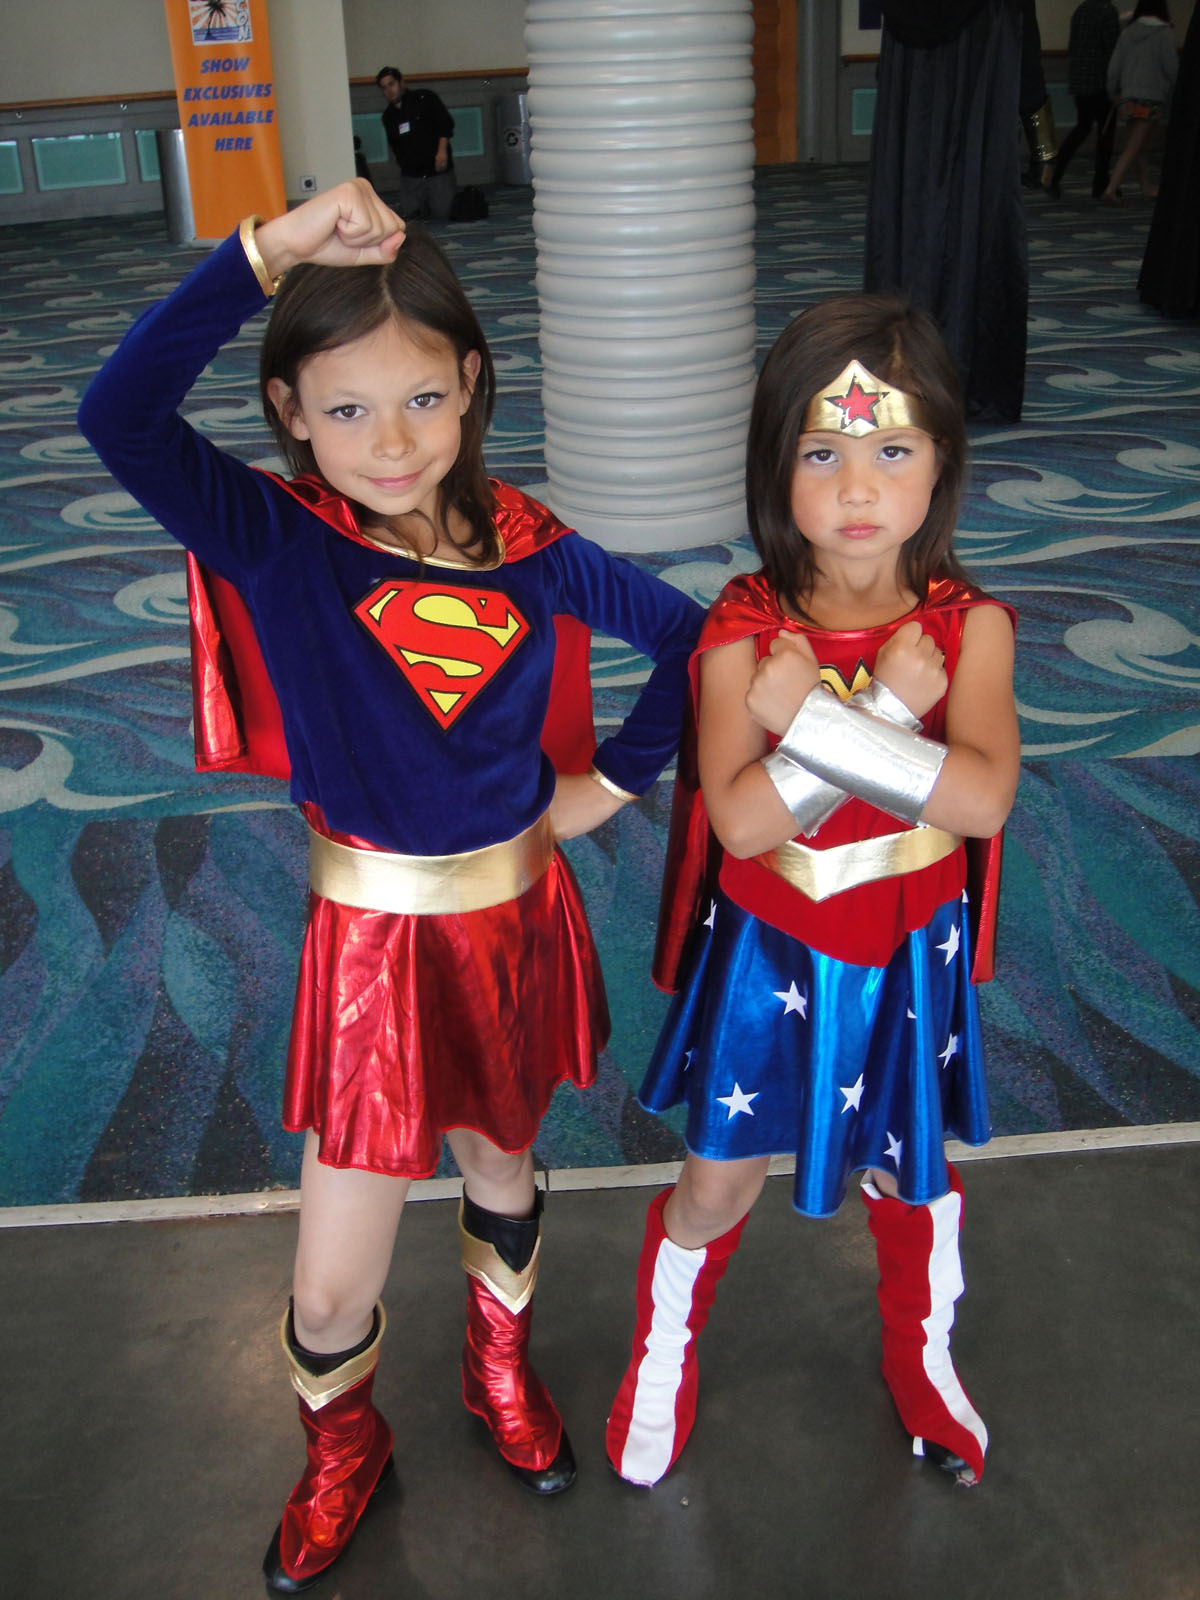 File:Long Beach Comic Expo 2011 - Little Supergirl and Wonder Woman (5648076391).jpg - Wikimedia ...